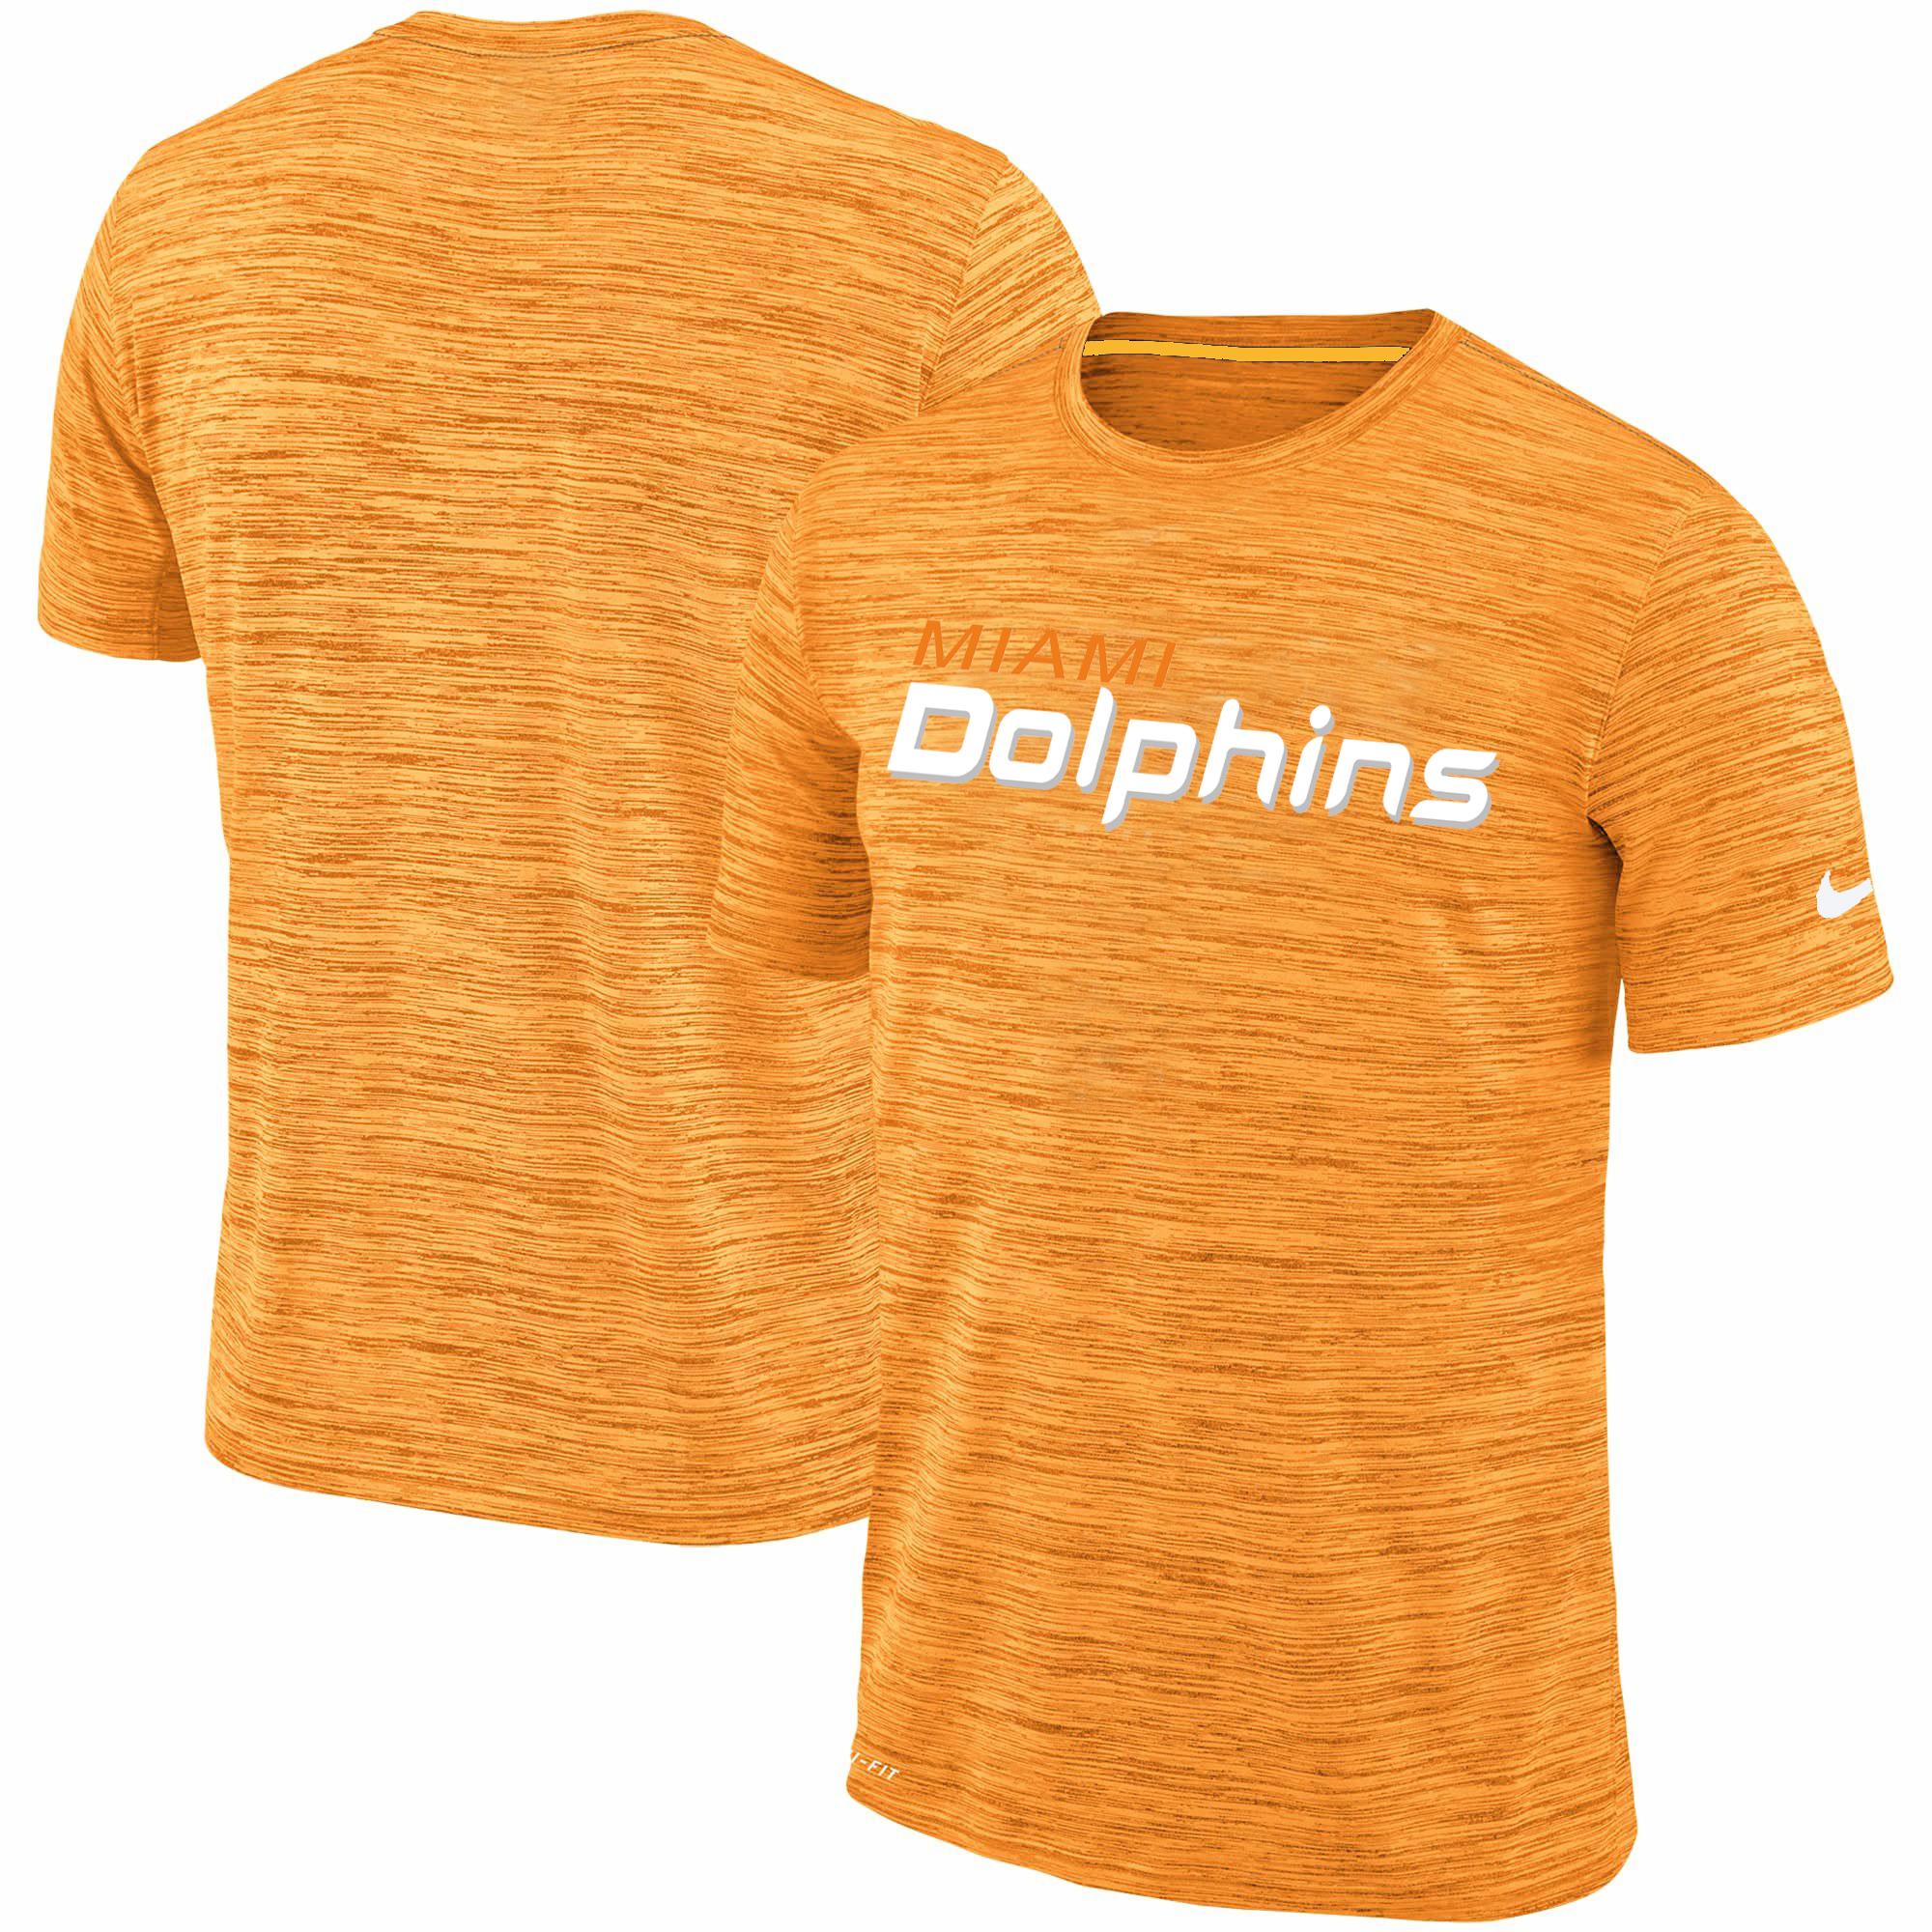 Men's Miami Dolphins Nike Orange Velocity Performance T-Shirt